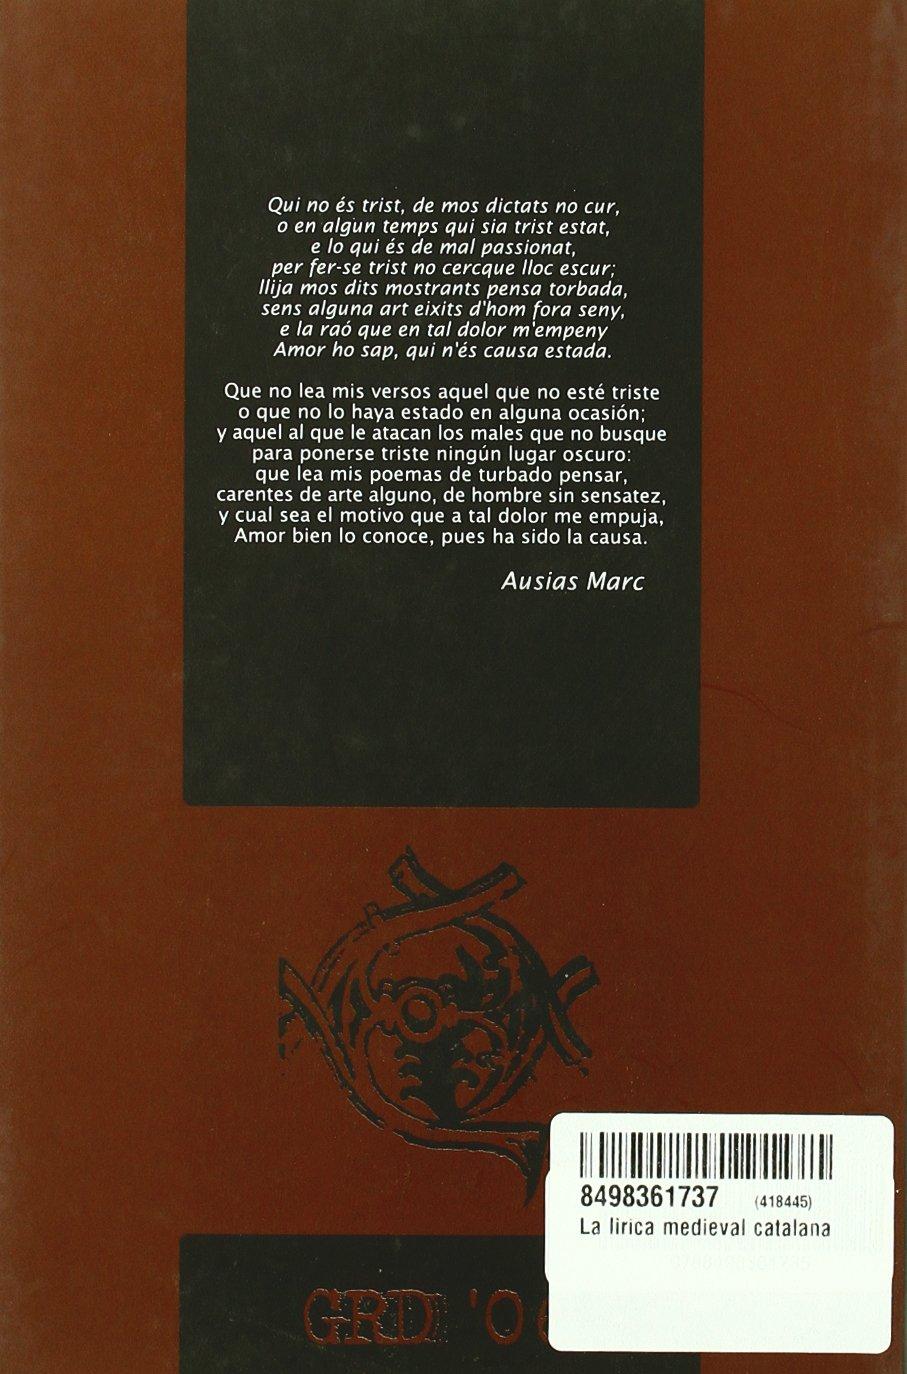 Lirica Medieval Catalana. Estudio Preliminar: 9788498361735: Amazon.com: Books